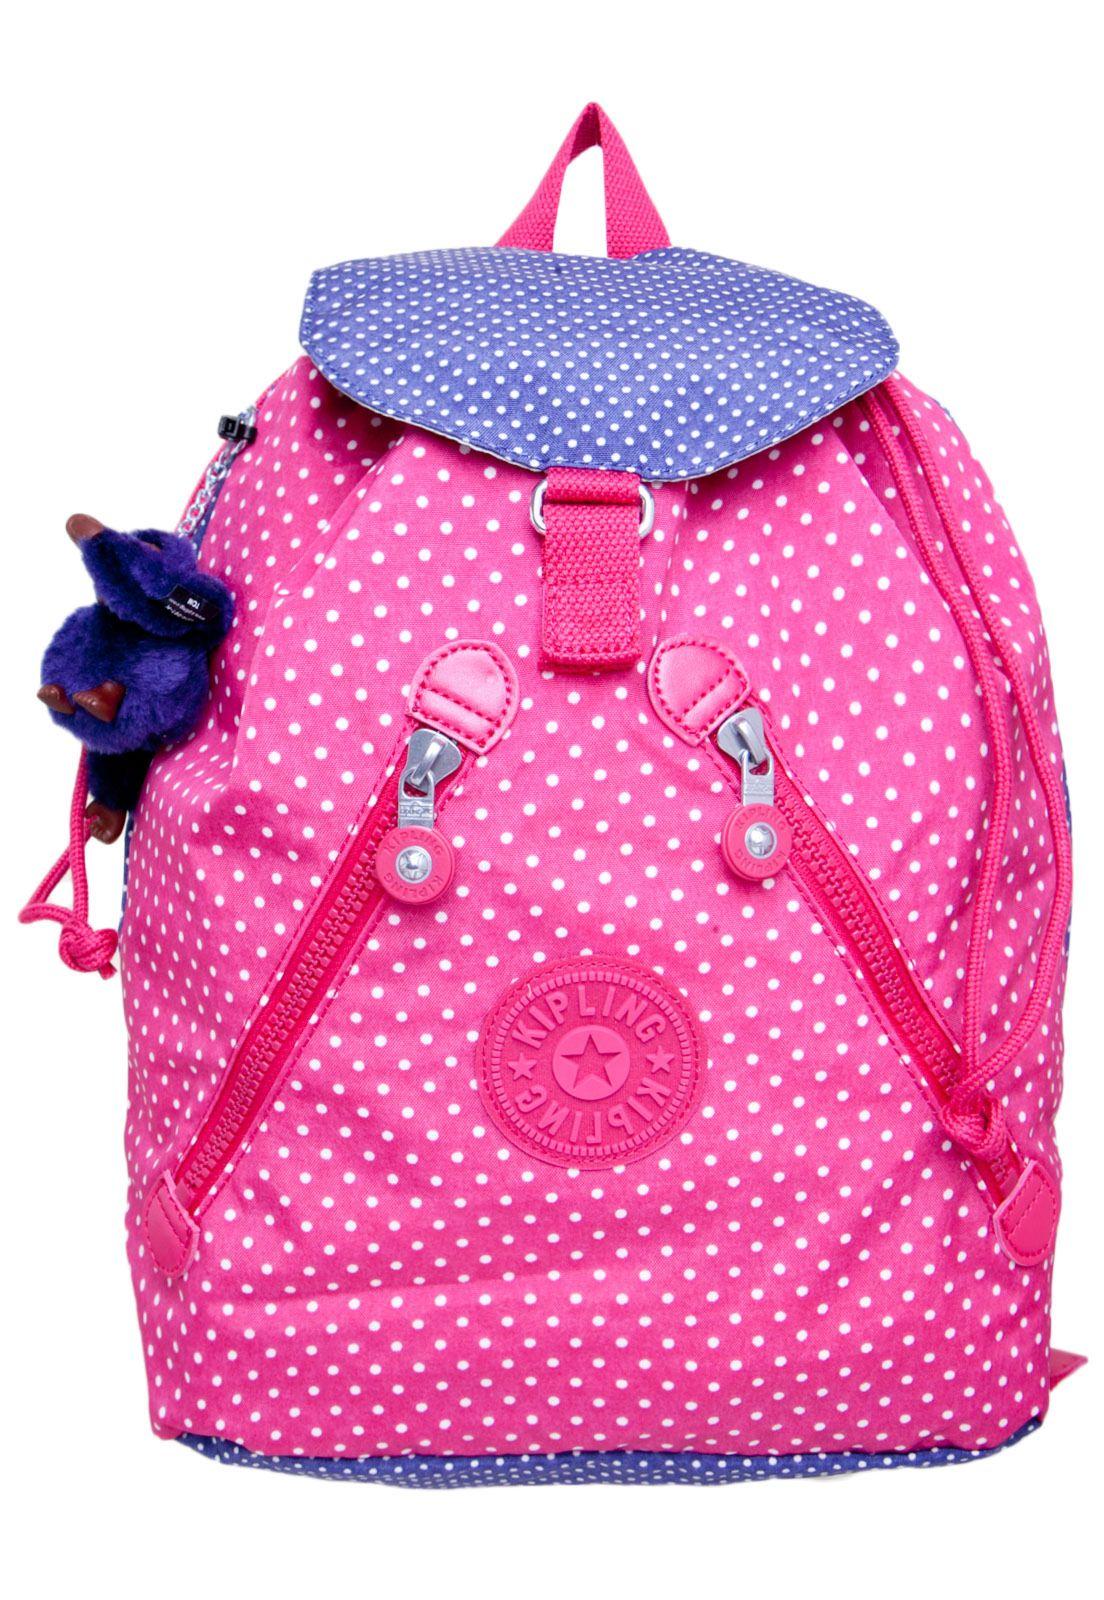 Bolsa Escolar Feminina Infantil : Mochila kipling rosa material escolar bolsinhas e mochilas